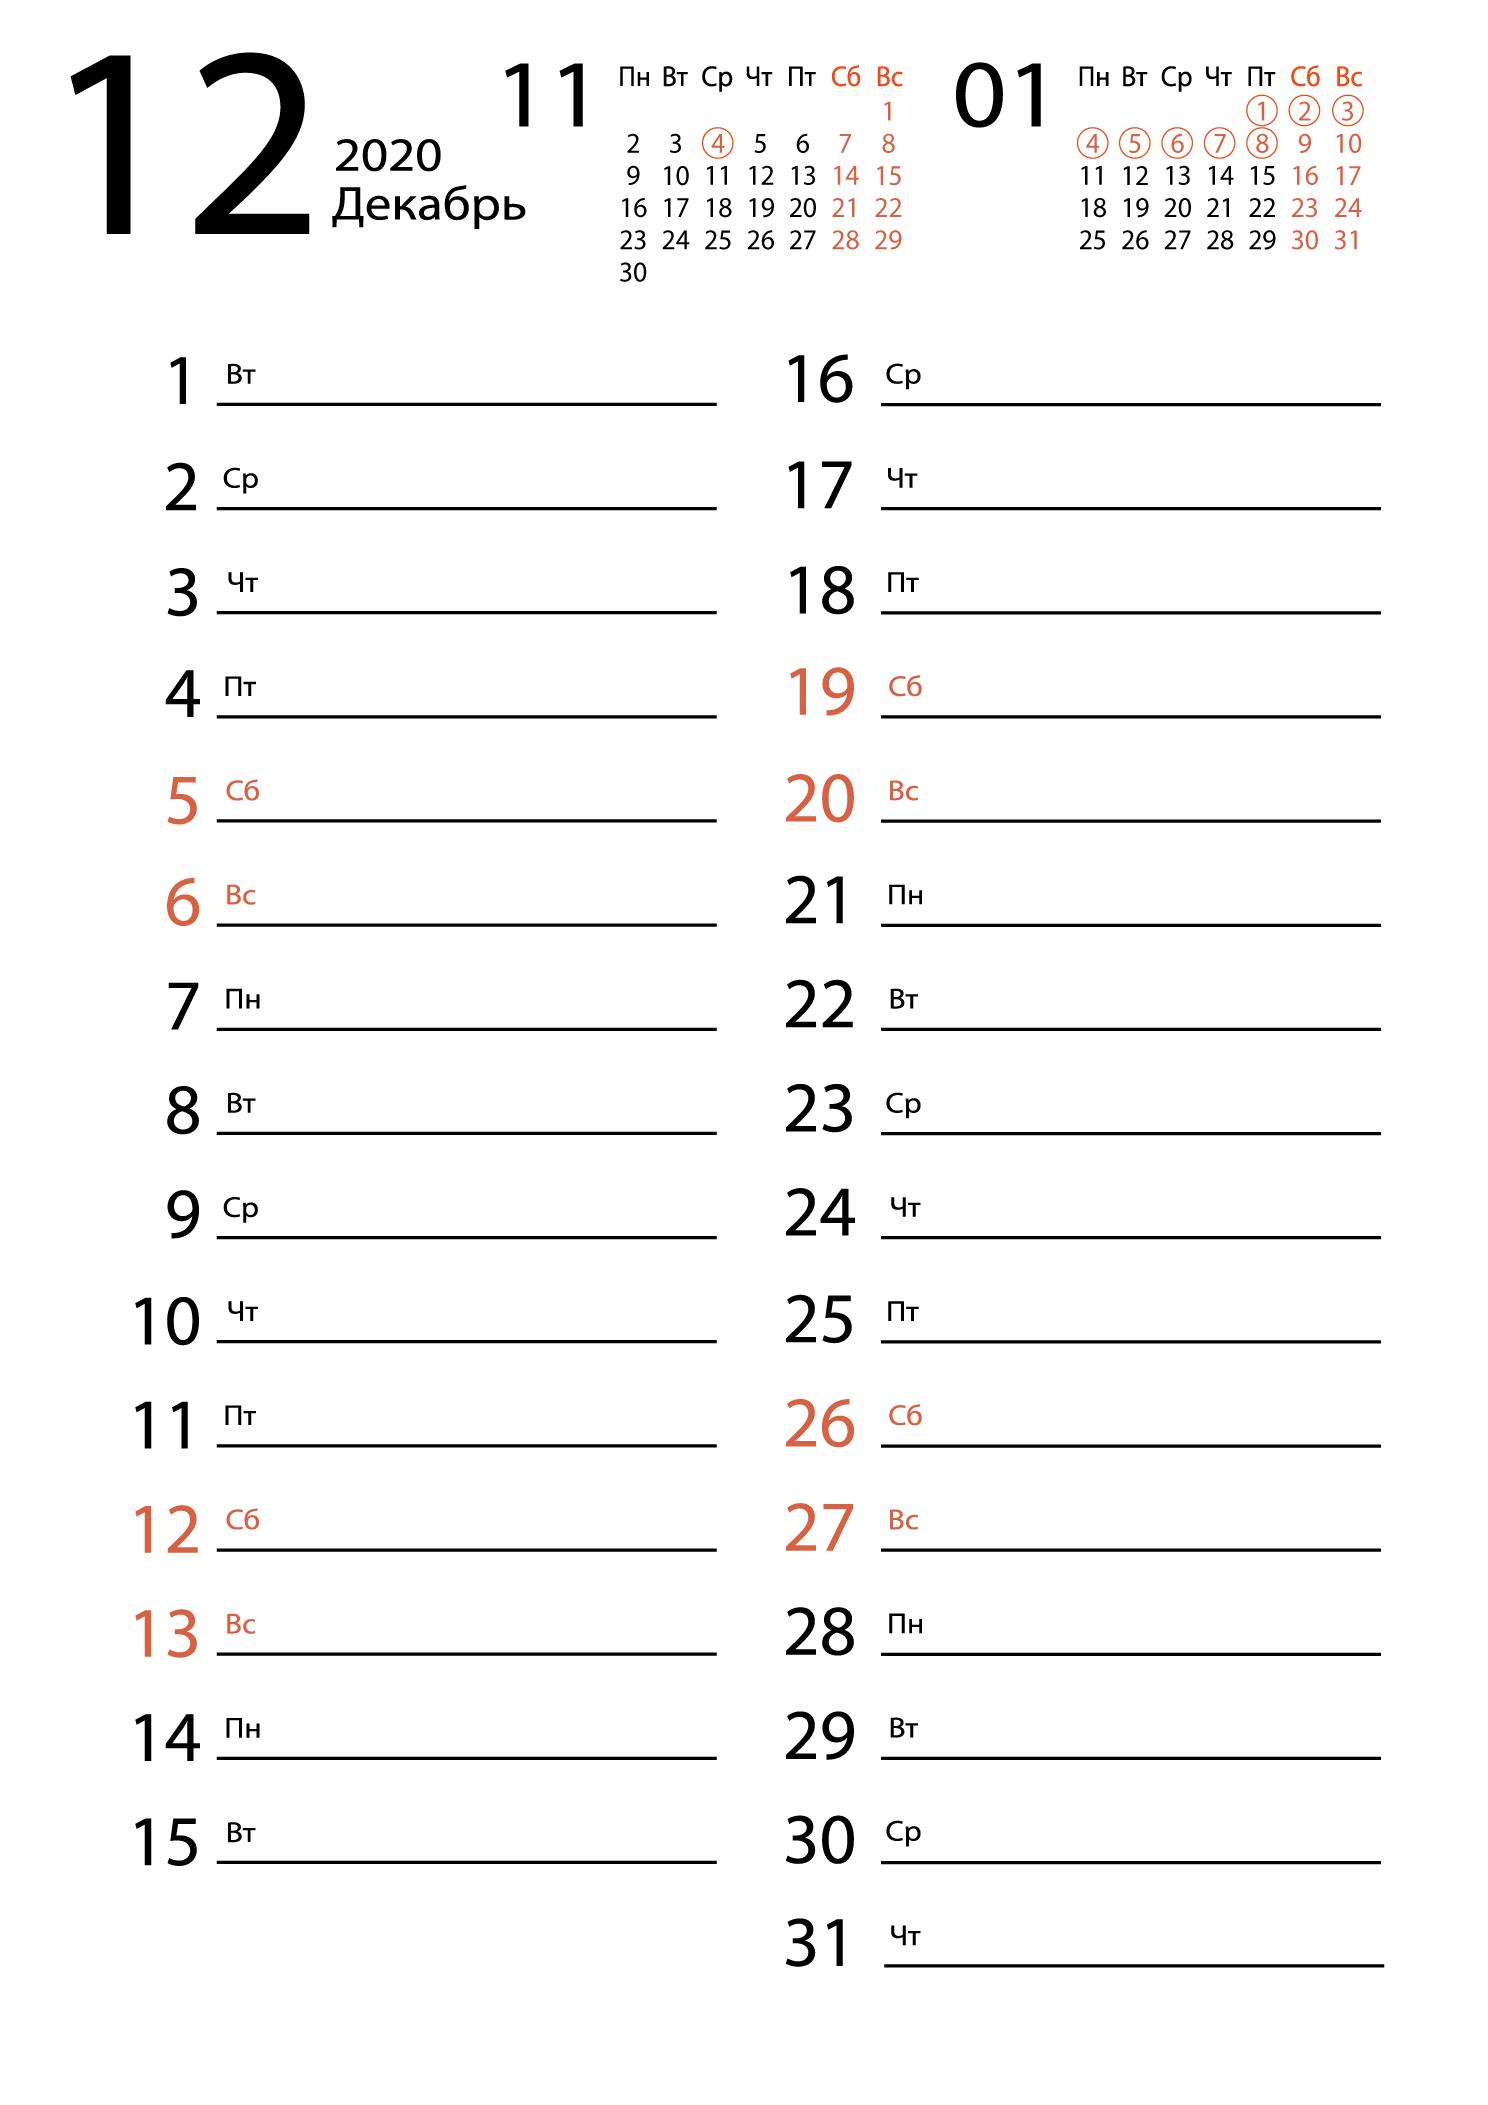 Календарь на декабрь 2020 (для заметок)